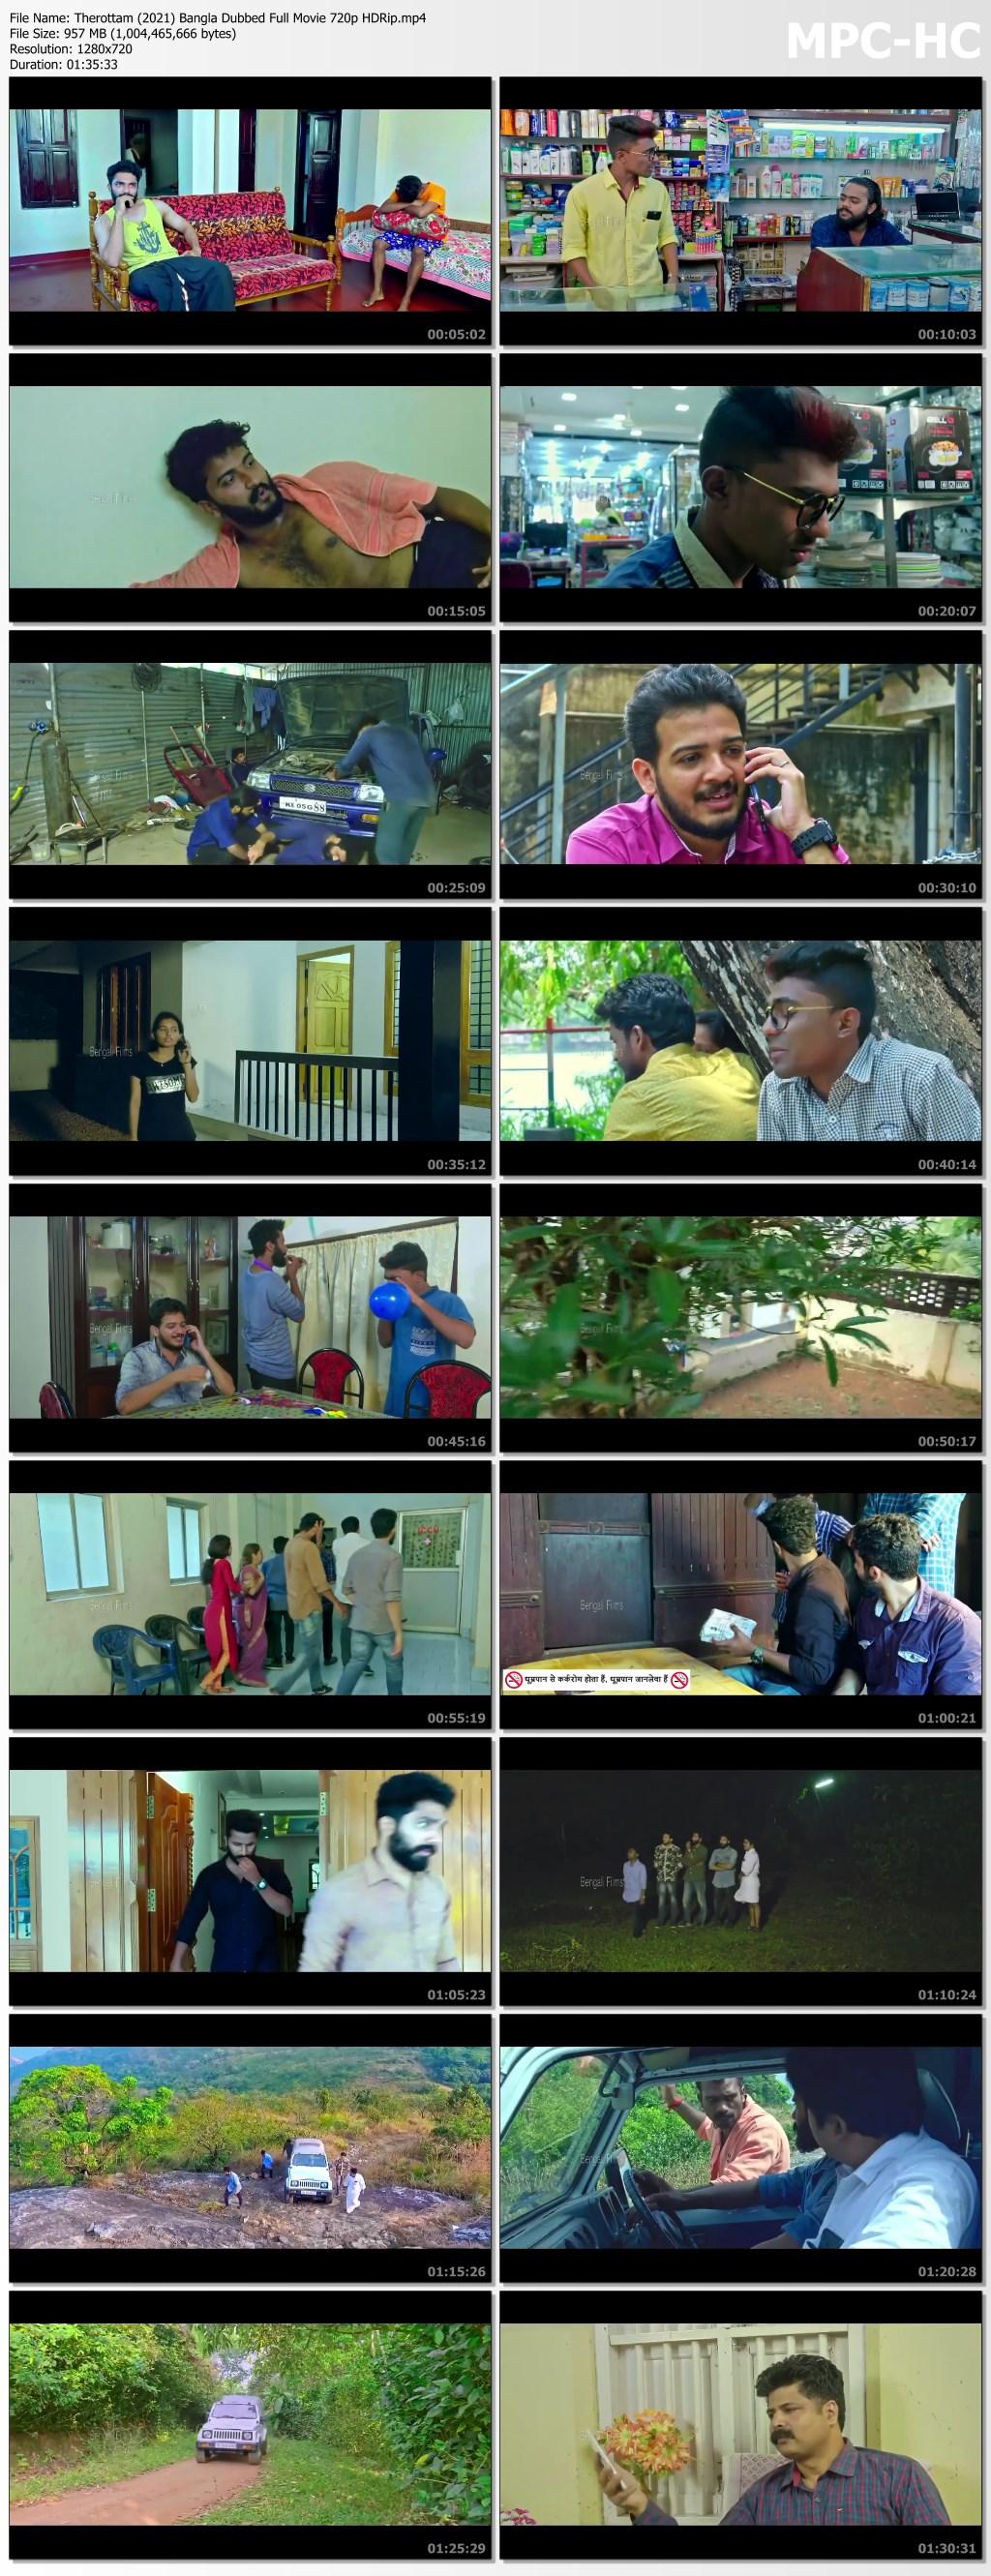 Therottam (2021) Bangla Dubbed Full Movie 720p HDRip.mp4 thumbs